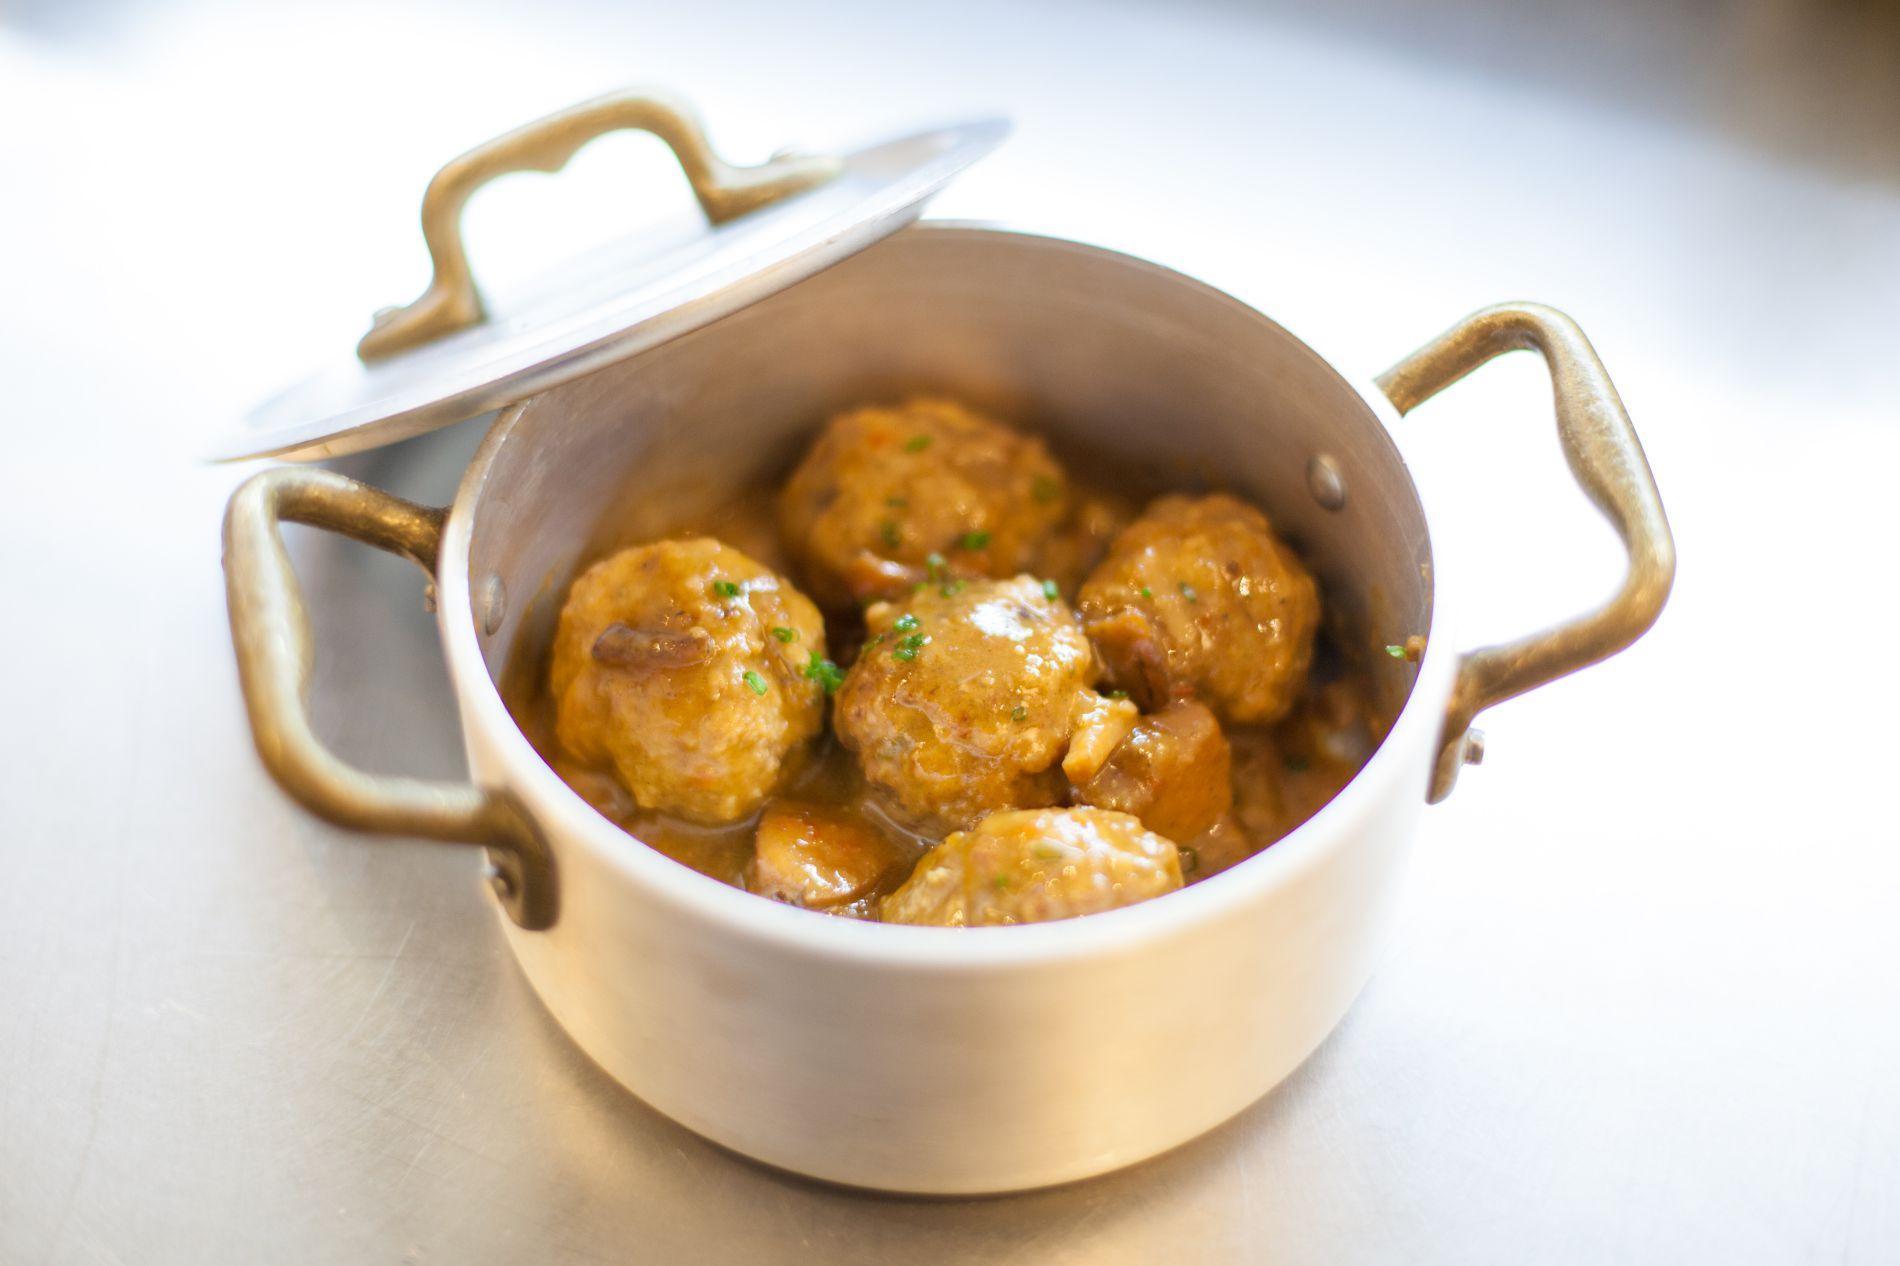 Guiso de albóndigas, un plato clásico pero que siempre apetece. Foto: Grill Room Bar Thonet.